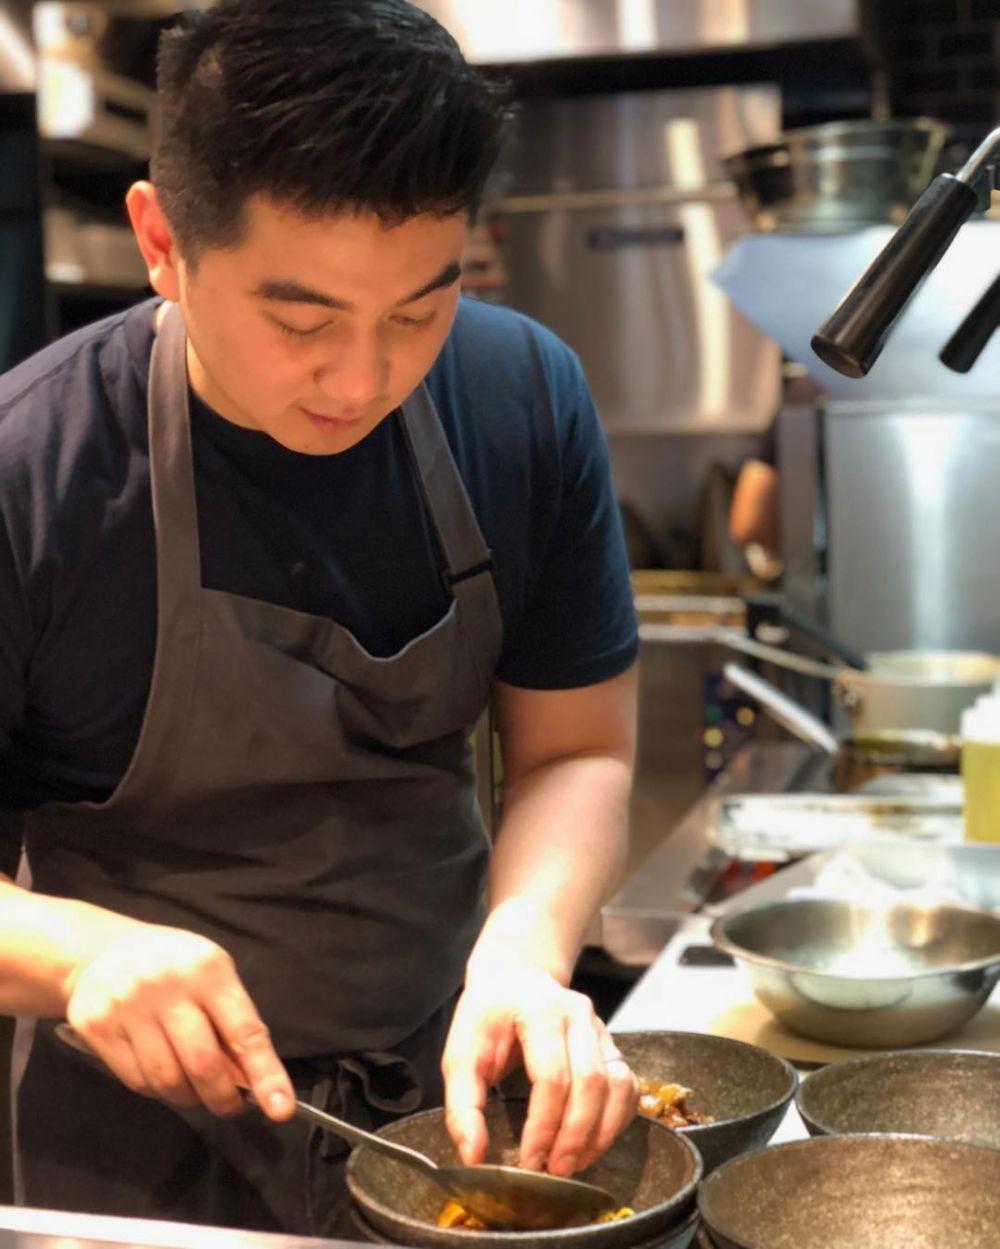 9 Potret Chef Arnold yang Berkarisma, Tatapannya Bikin Deg-degan!